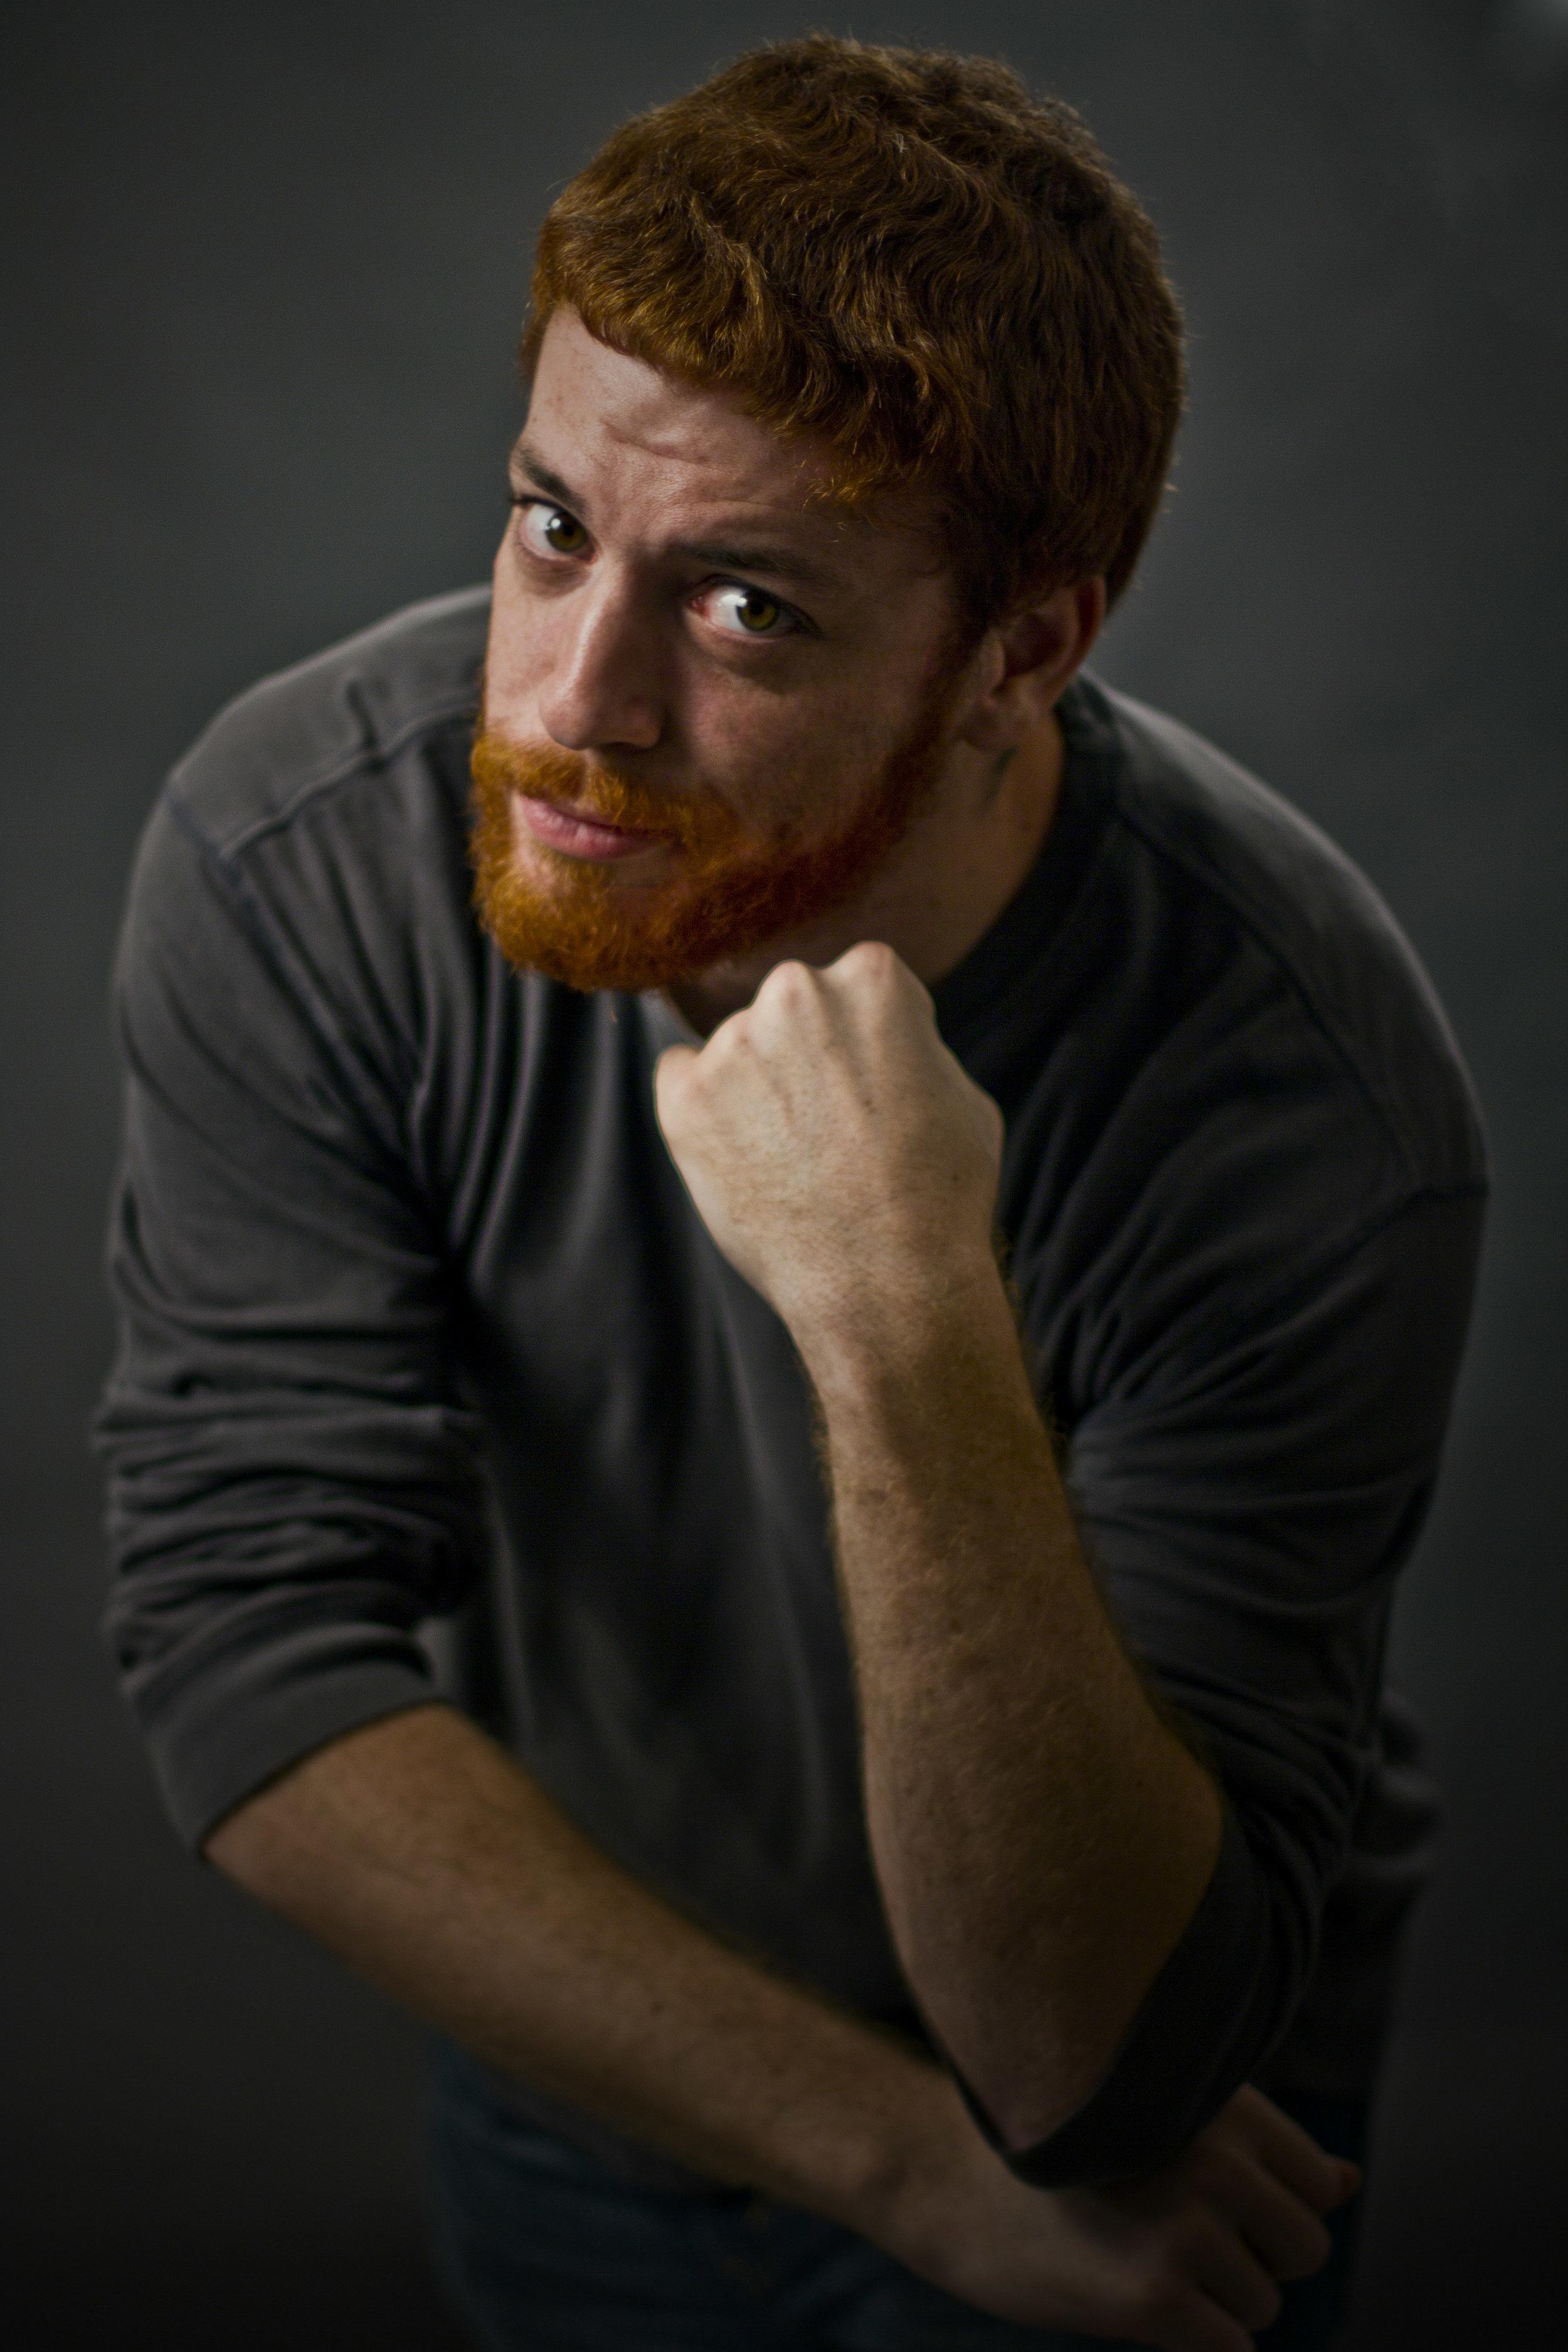 Bearded Pose gray shirt.jpg